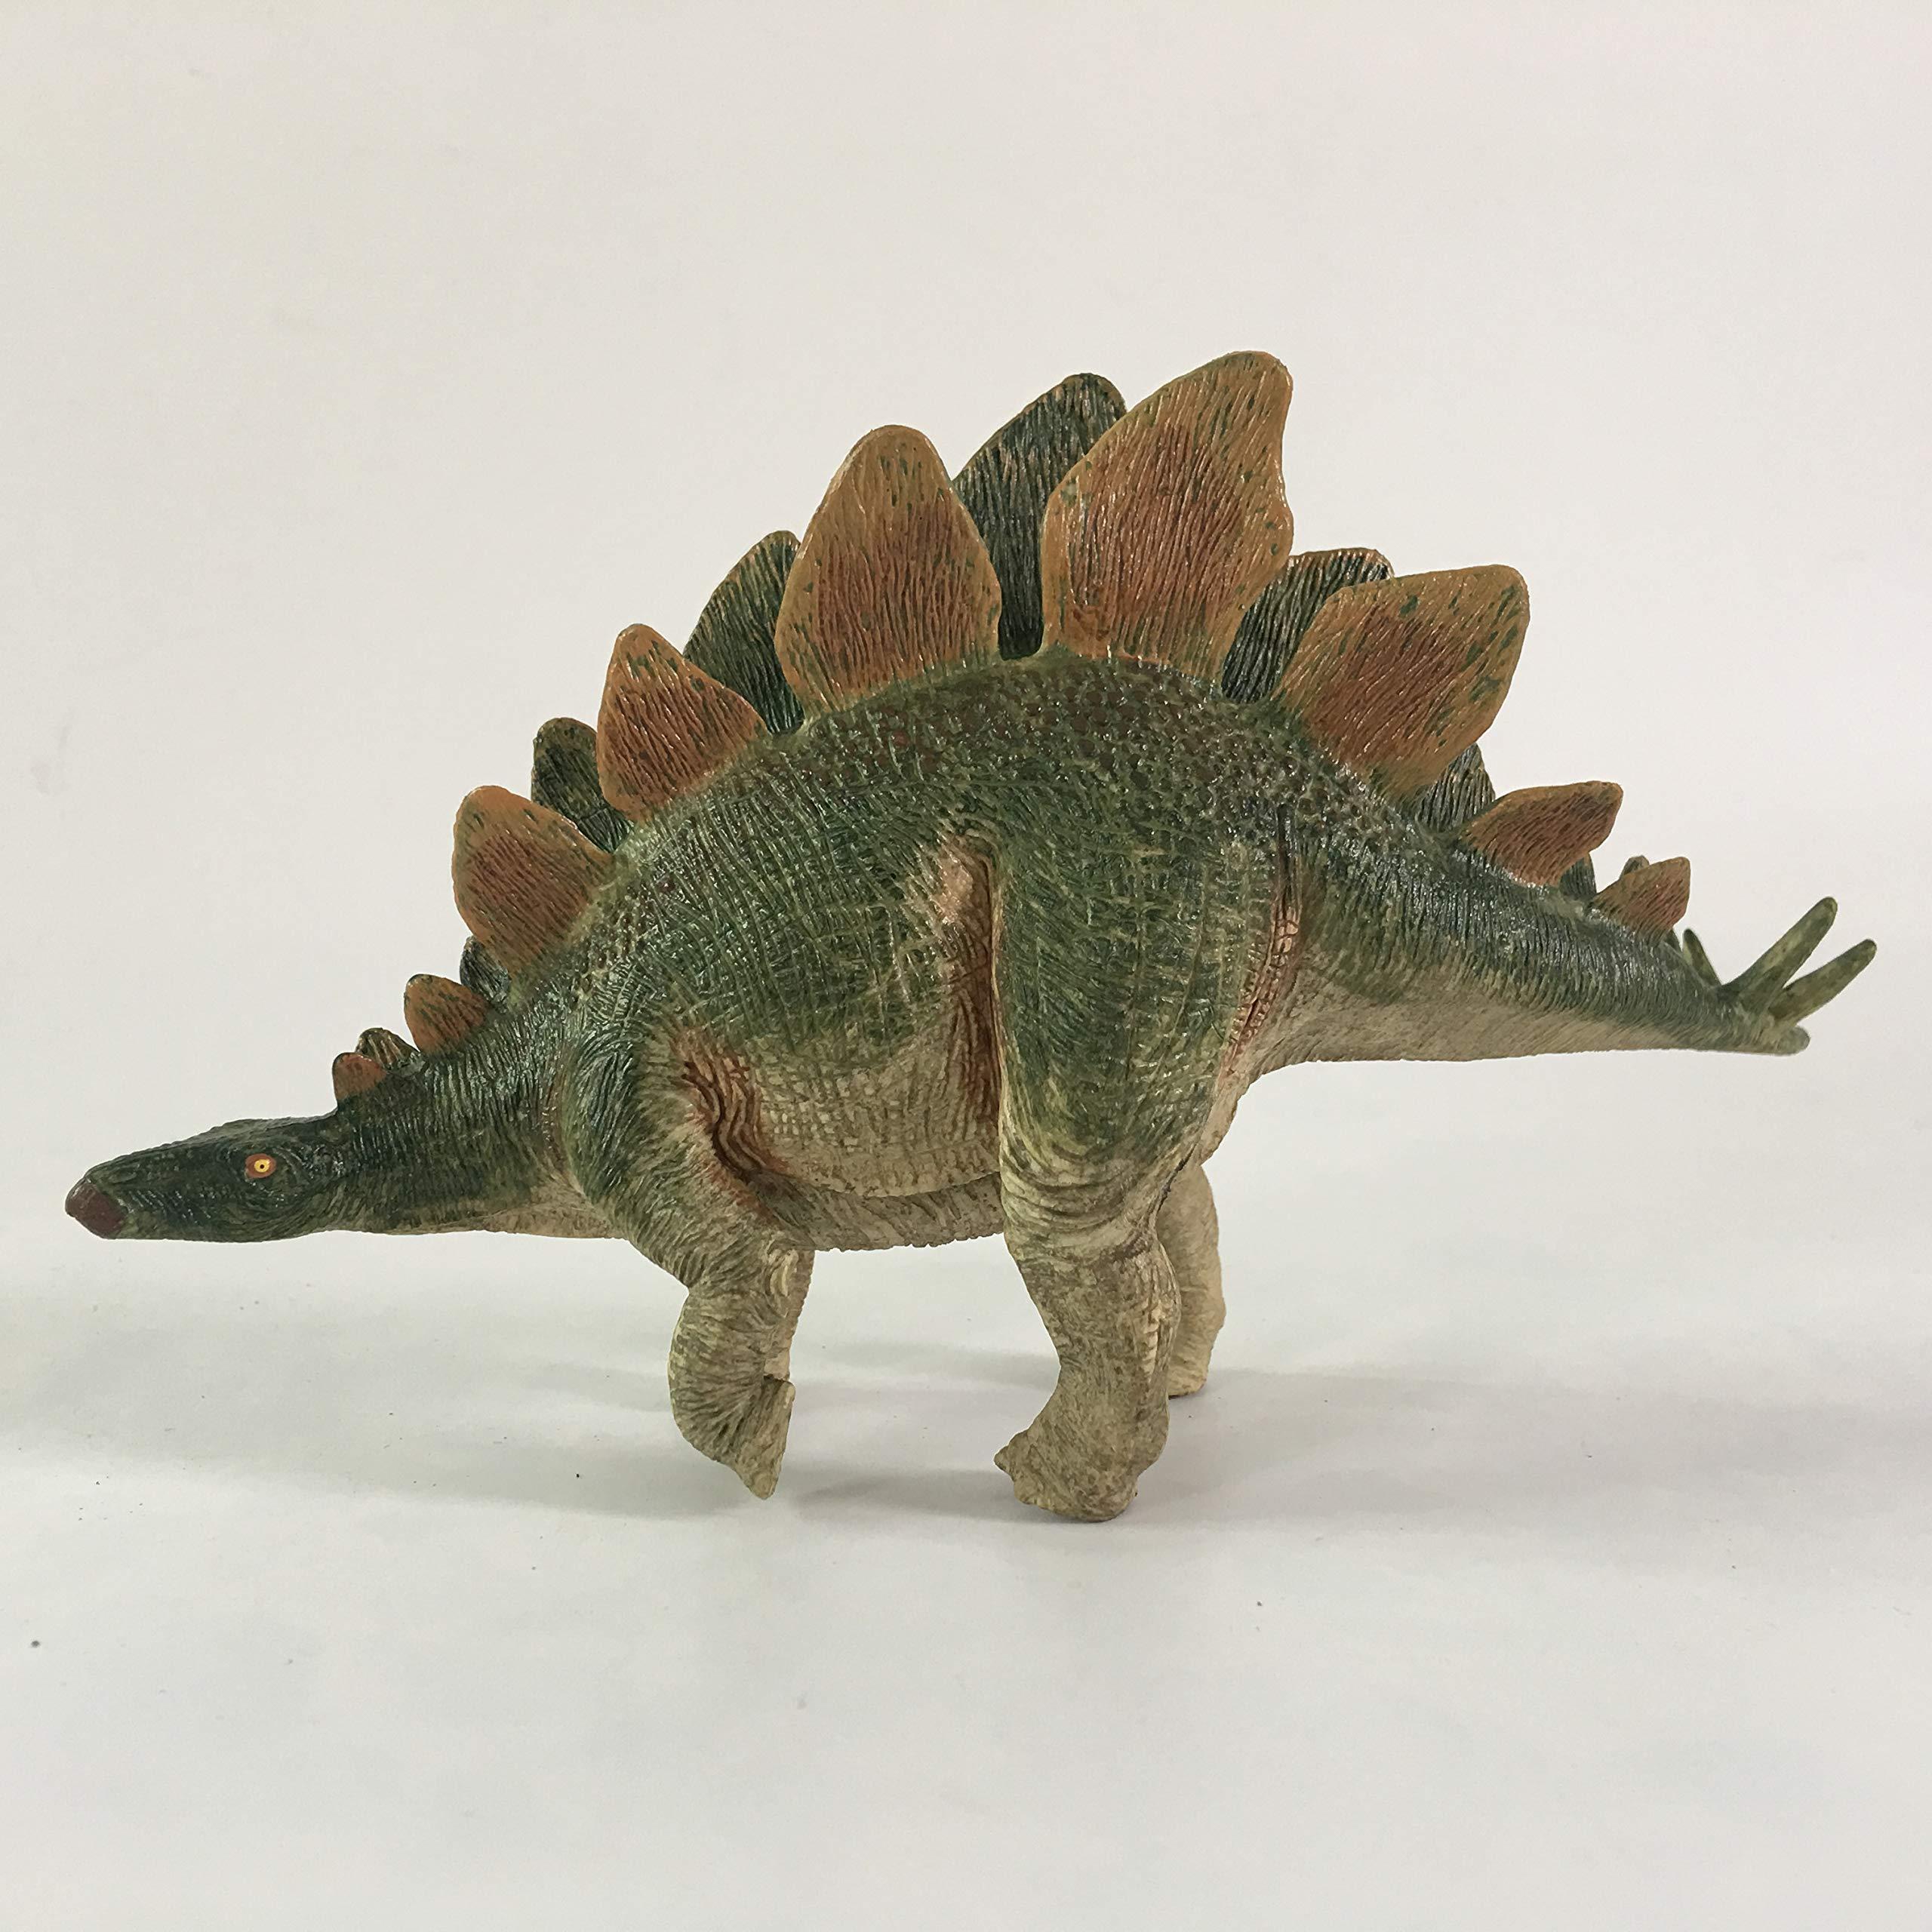 JIENI Educational Dinosaur Toys, Kids Realistic Toy Dinosaur Figures Authentic Type Plastic Dinosaurs Jurassic Dinosaur Statue Kids and Toddler Education ( M5001 )